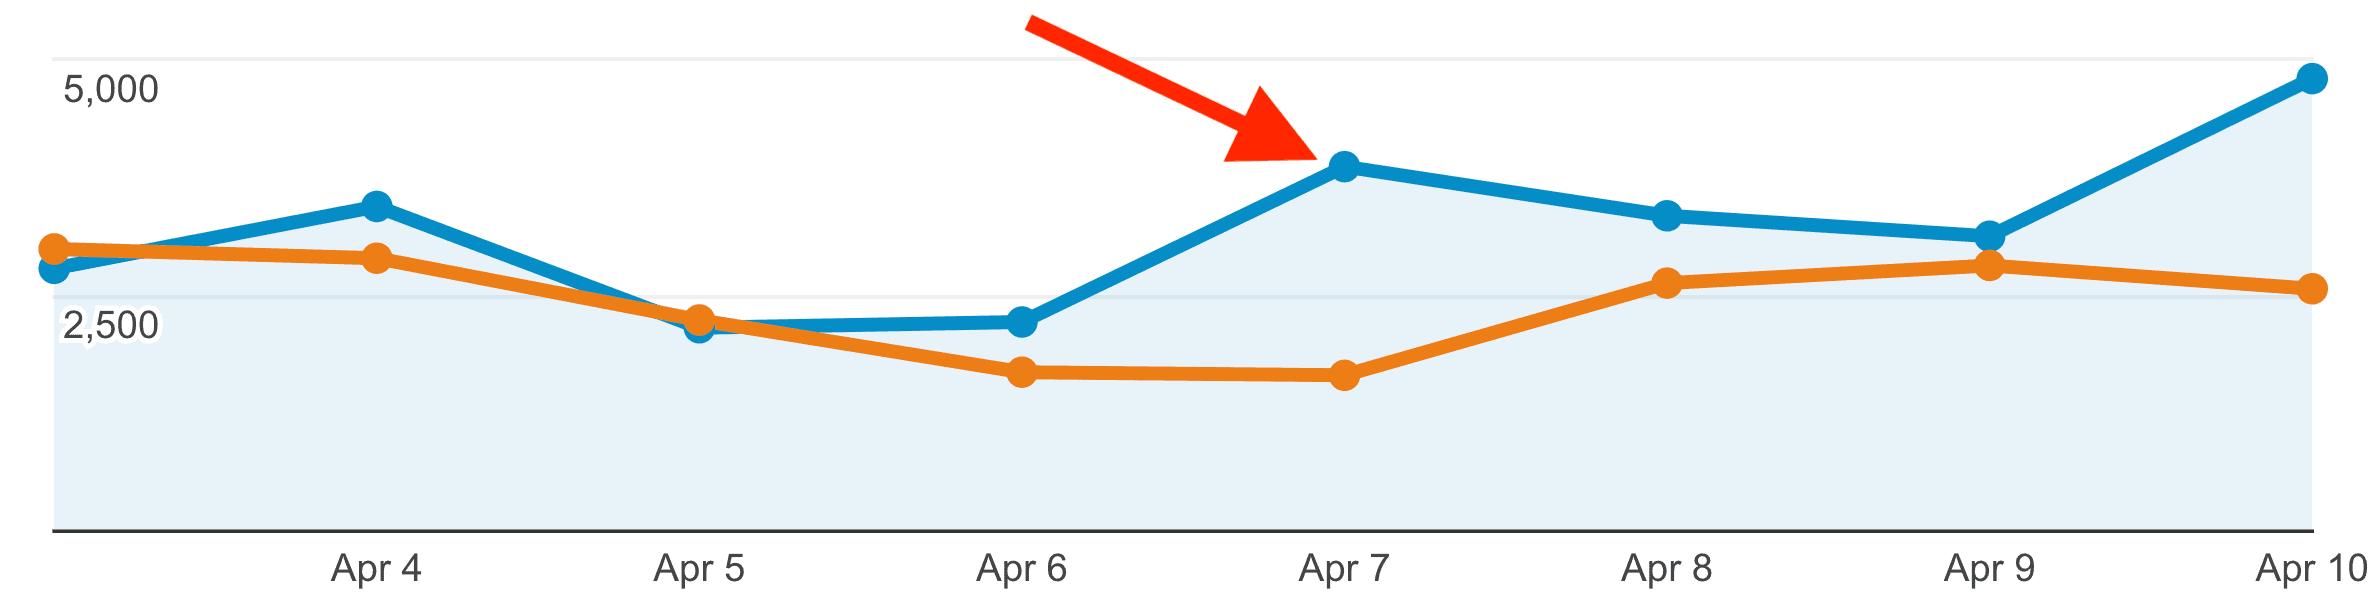 Backlinko – OKDork guest post – Traffic increase